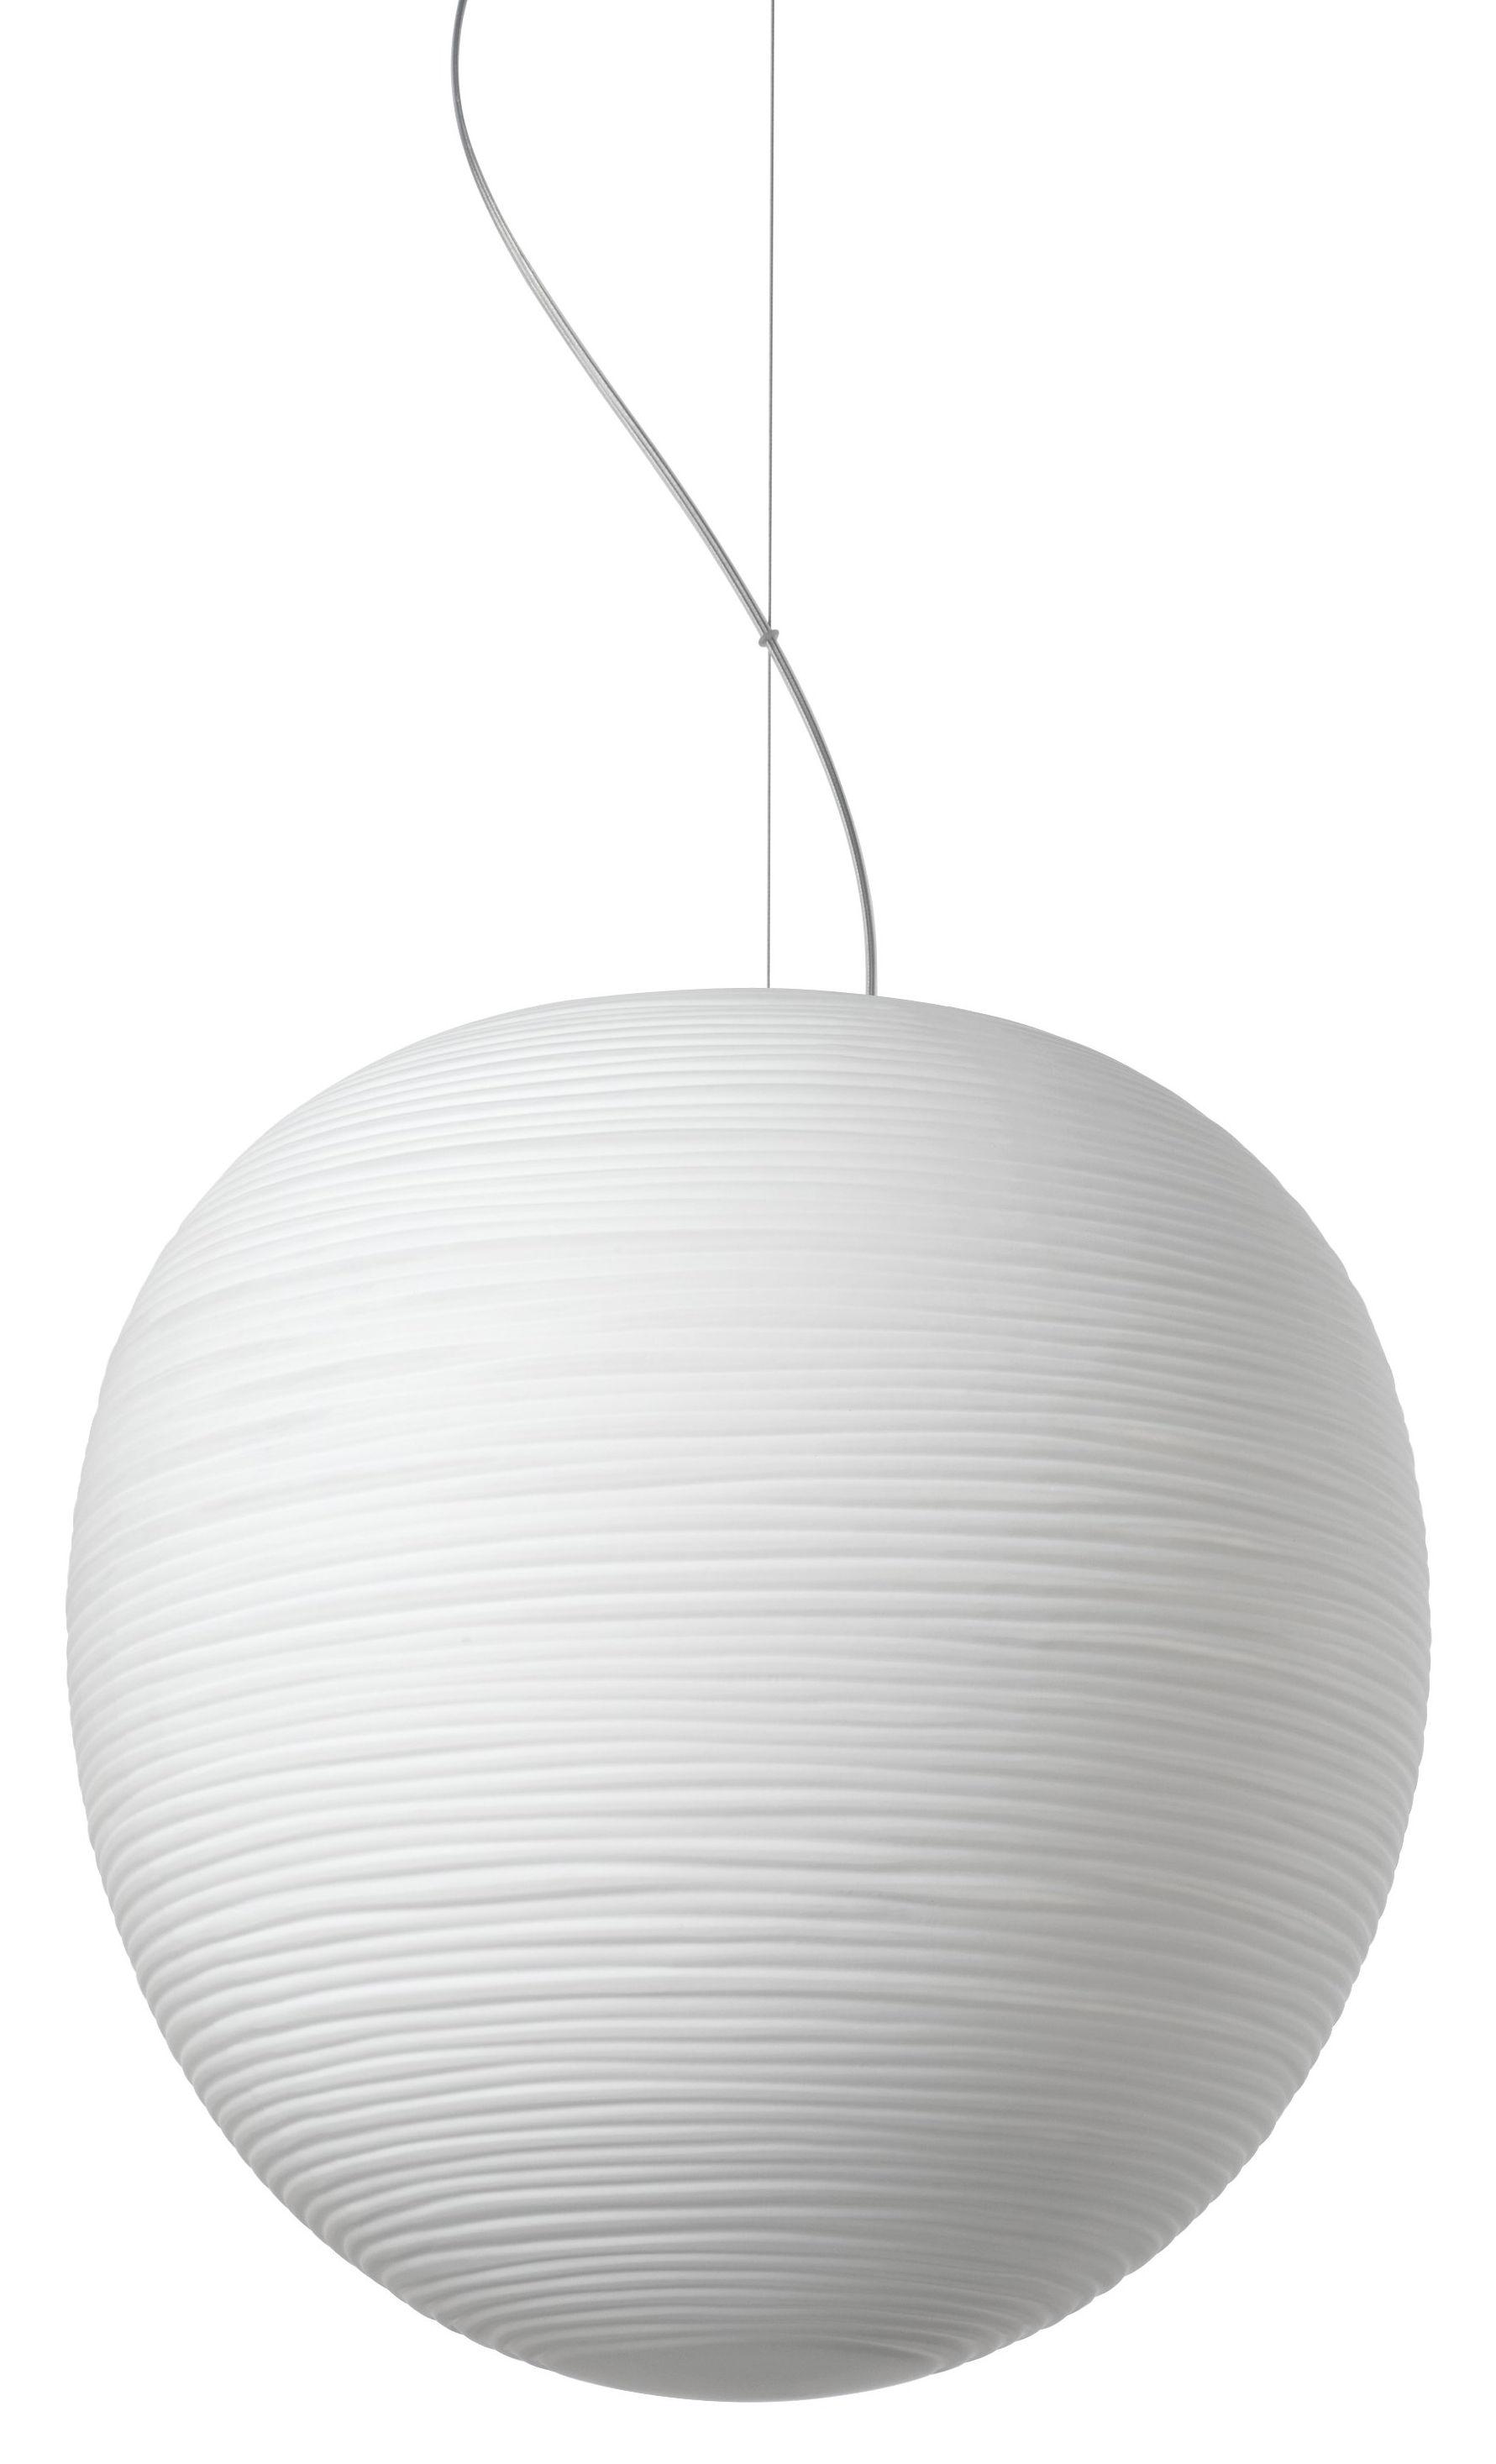 Lighting - Pendant Lighting - Rituals XL Pendant by Foscarini - White / Ø 40 x H 41 cm - Mouth blown glass